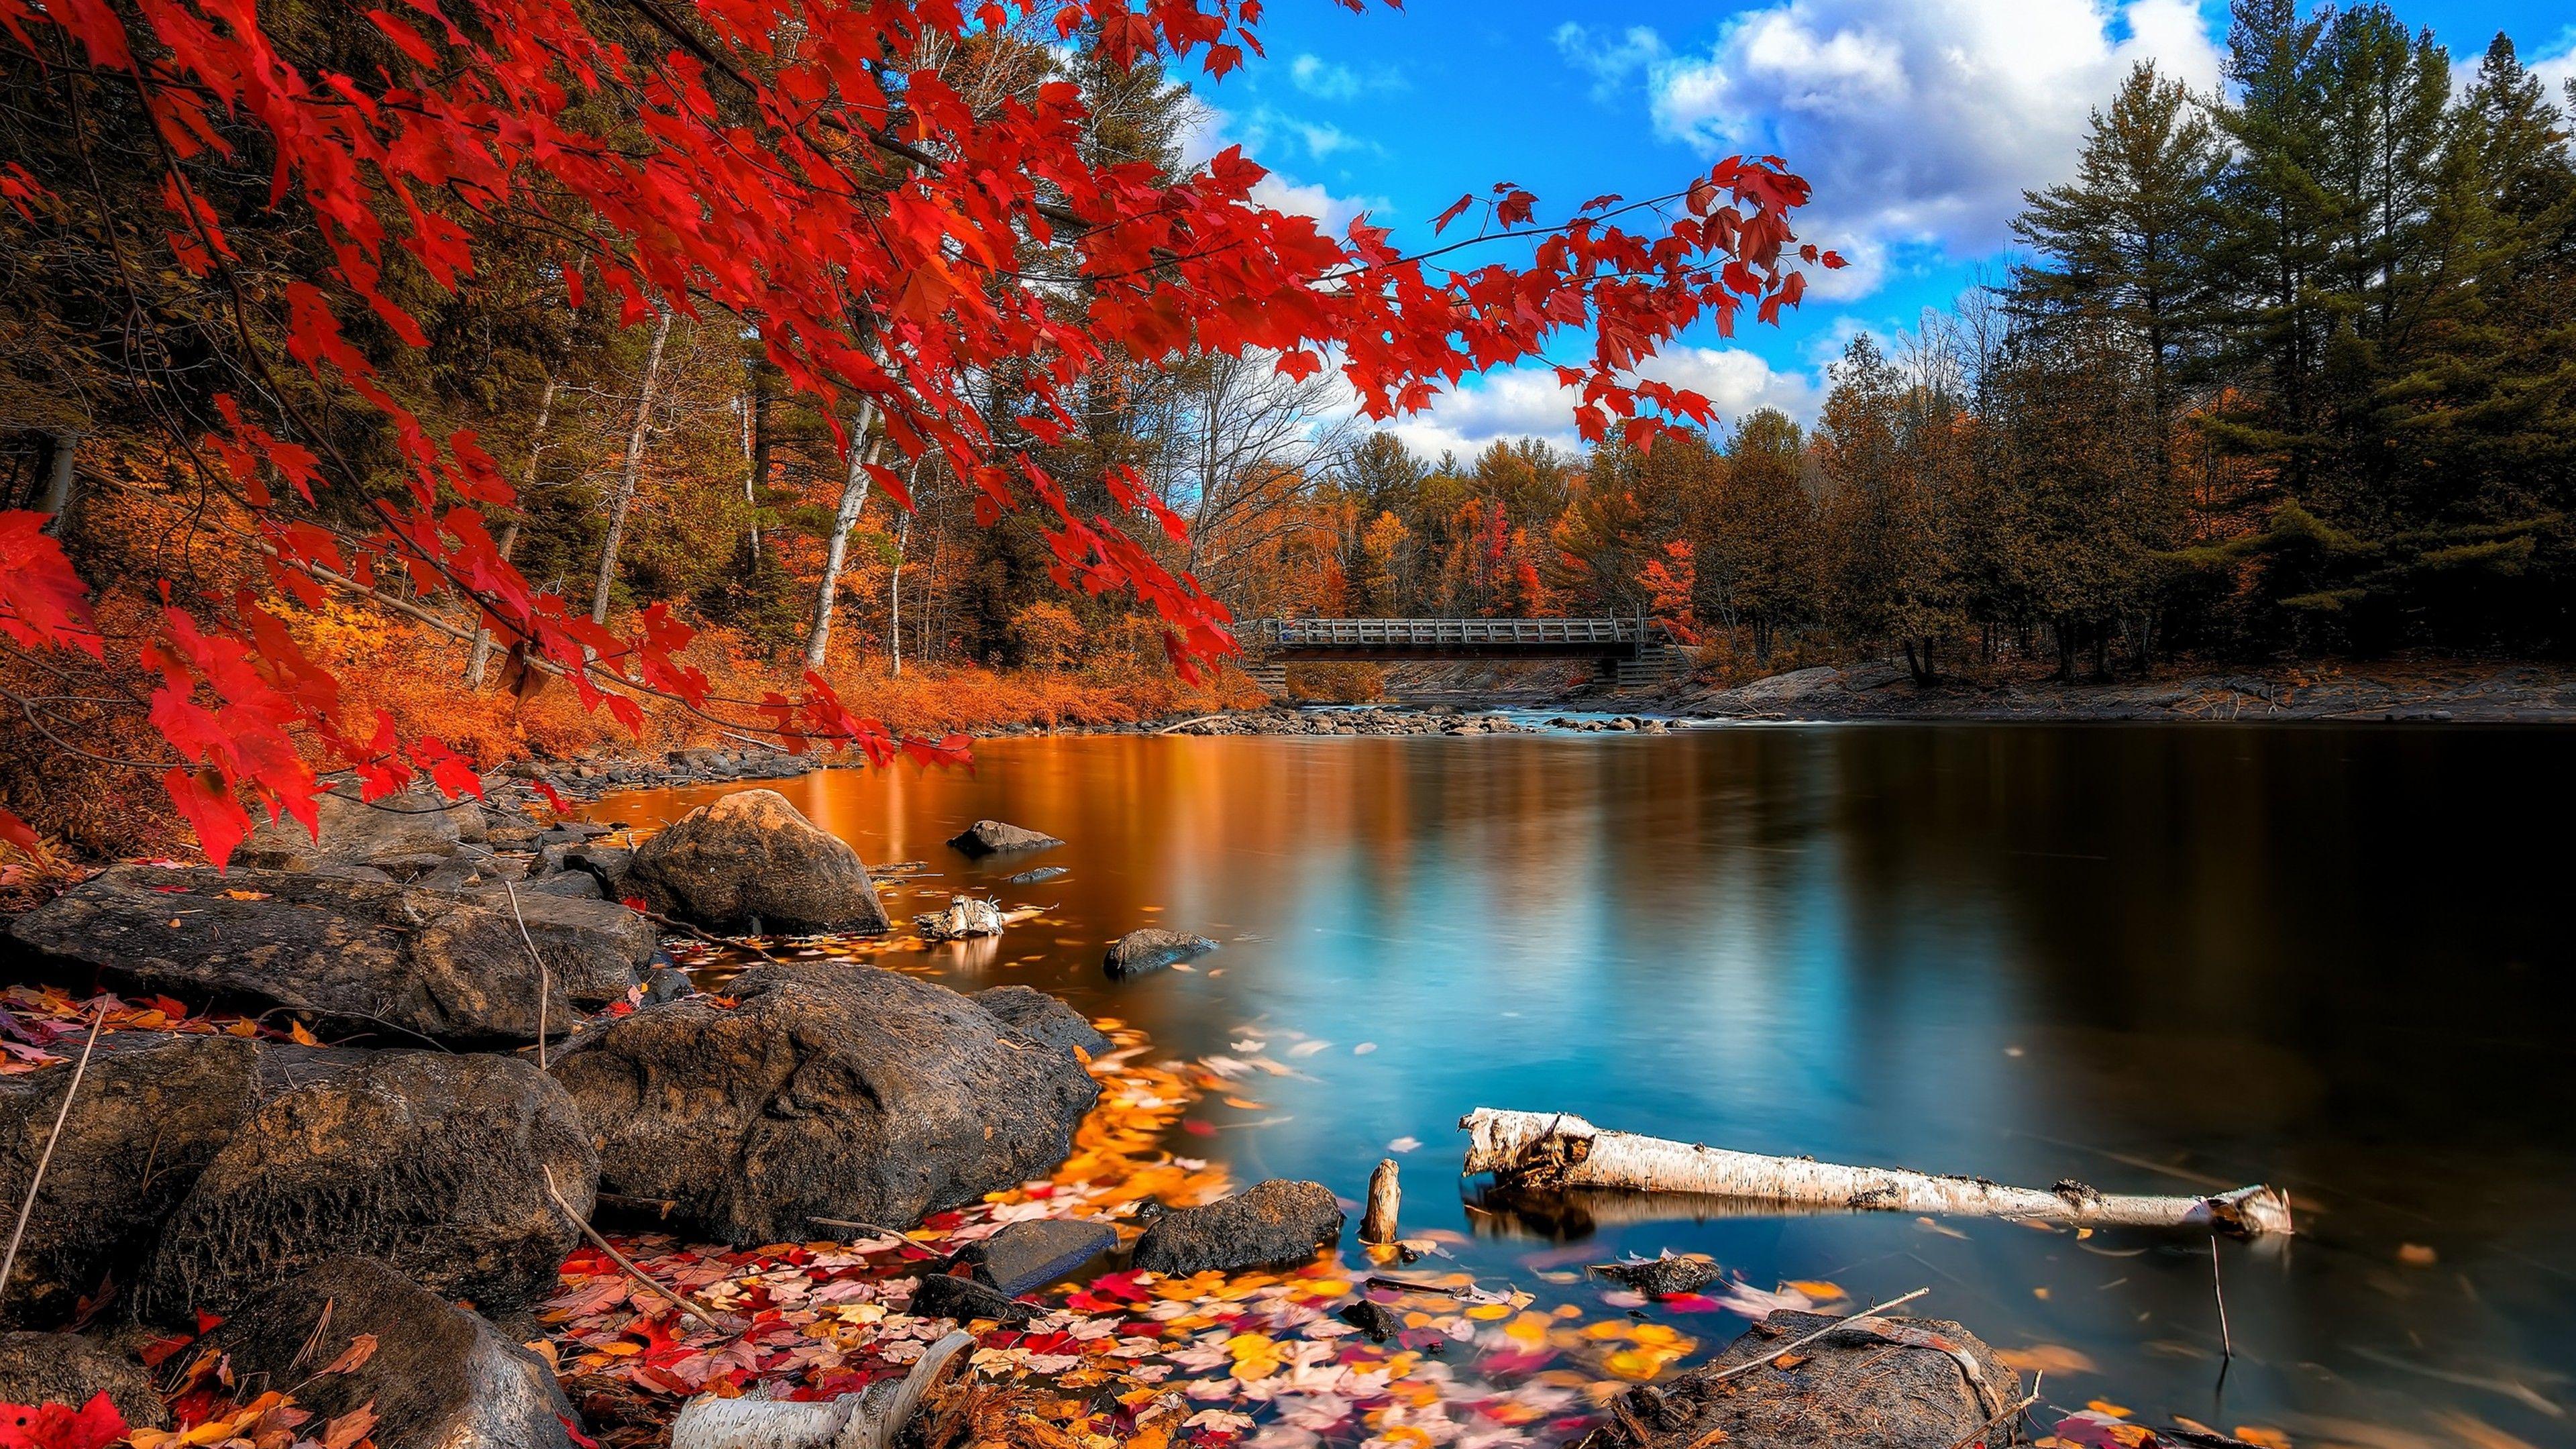 Fall Foliage Desktop Wallpapers Wallpaper Wiki Nature Desktop Autumn Scenery Scenery Wallpaper